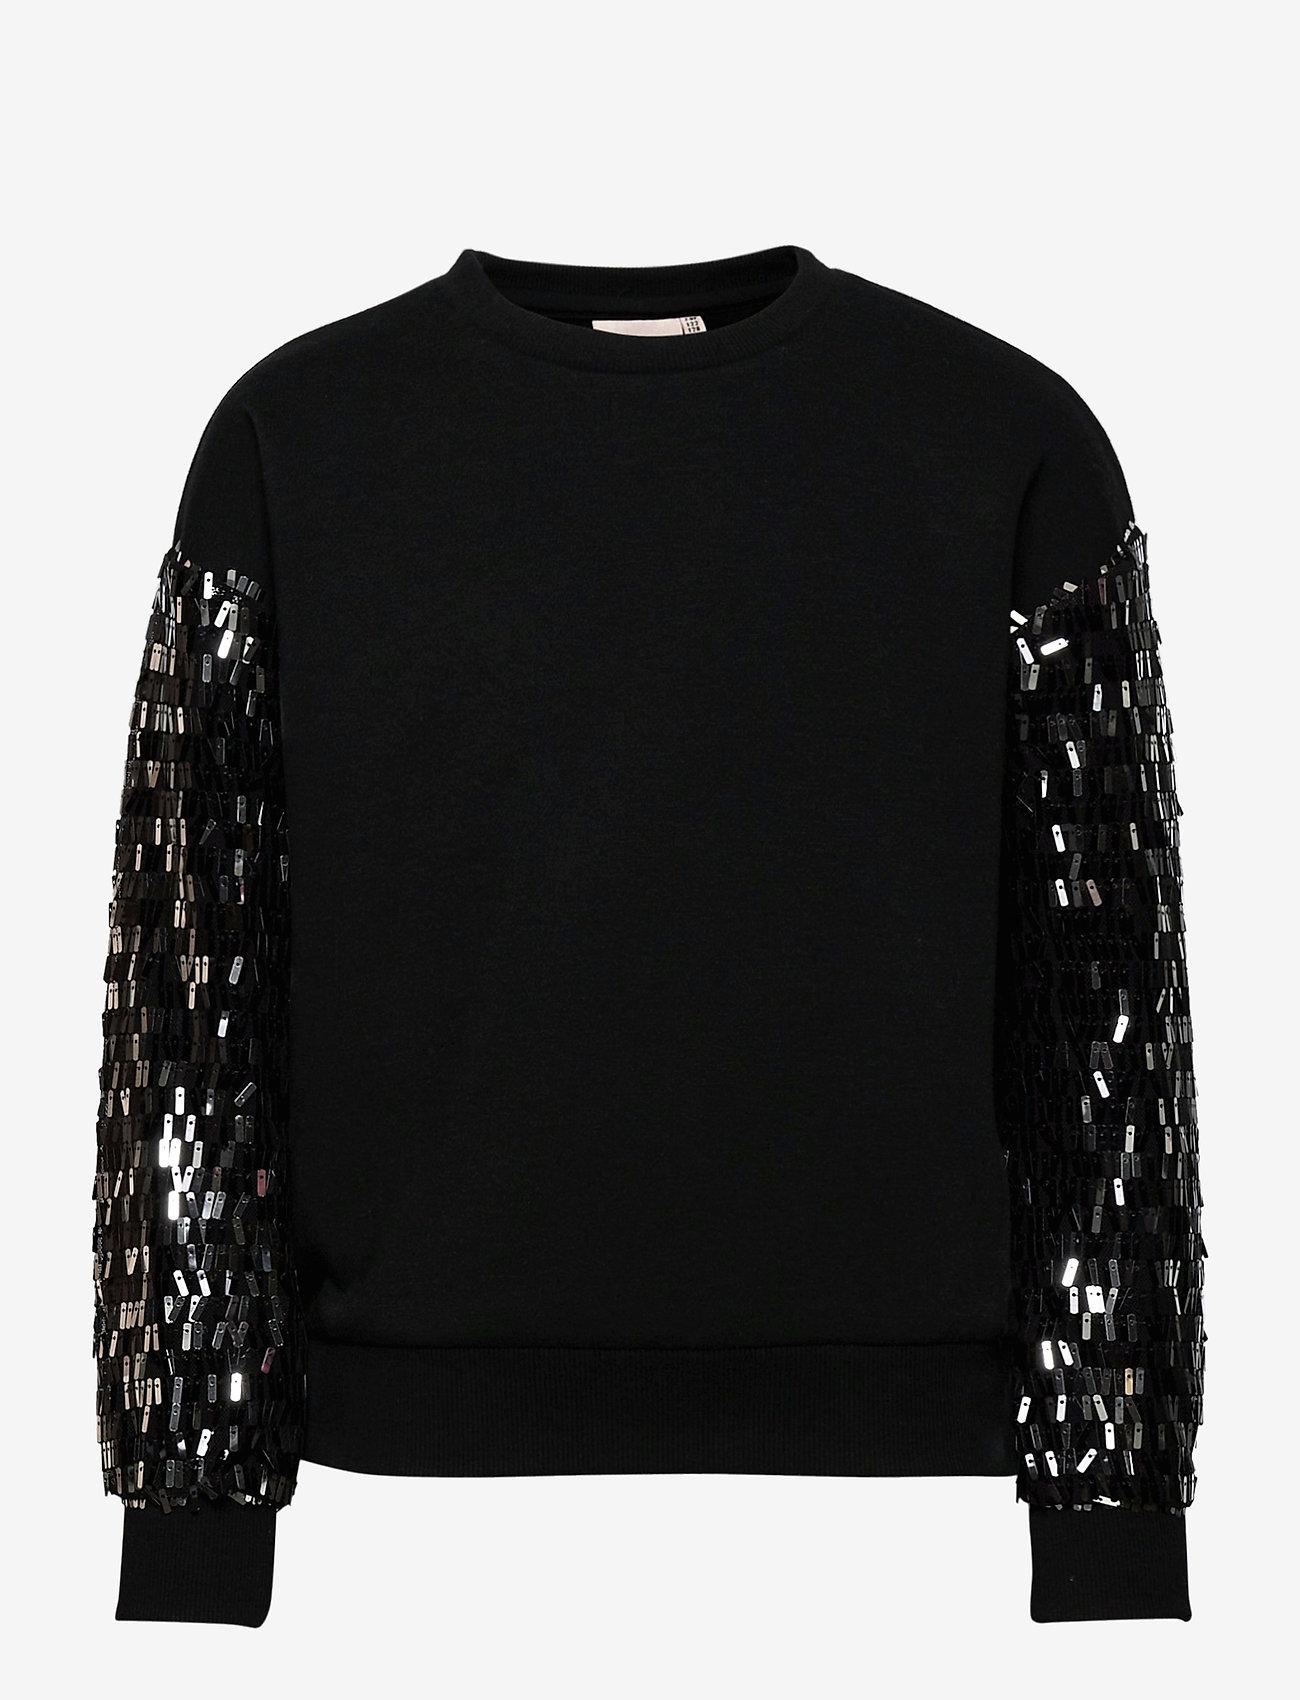 Kids Only - KONOLGA L/S SEQUINS SWT - sweatshirts - black - 0